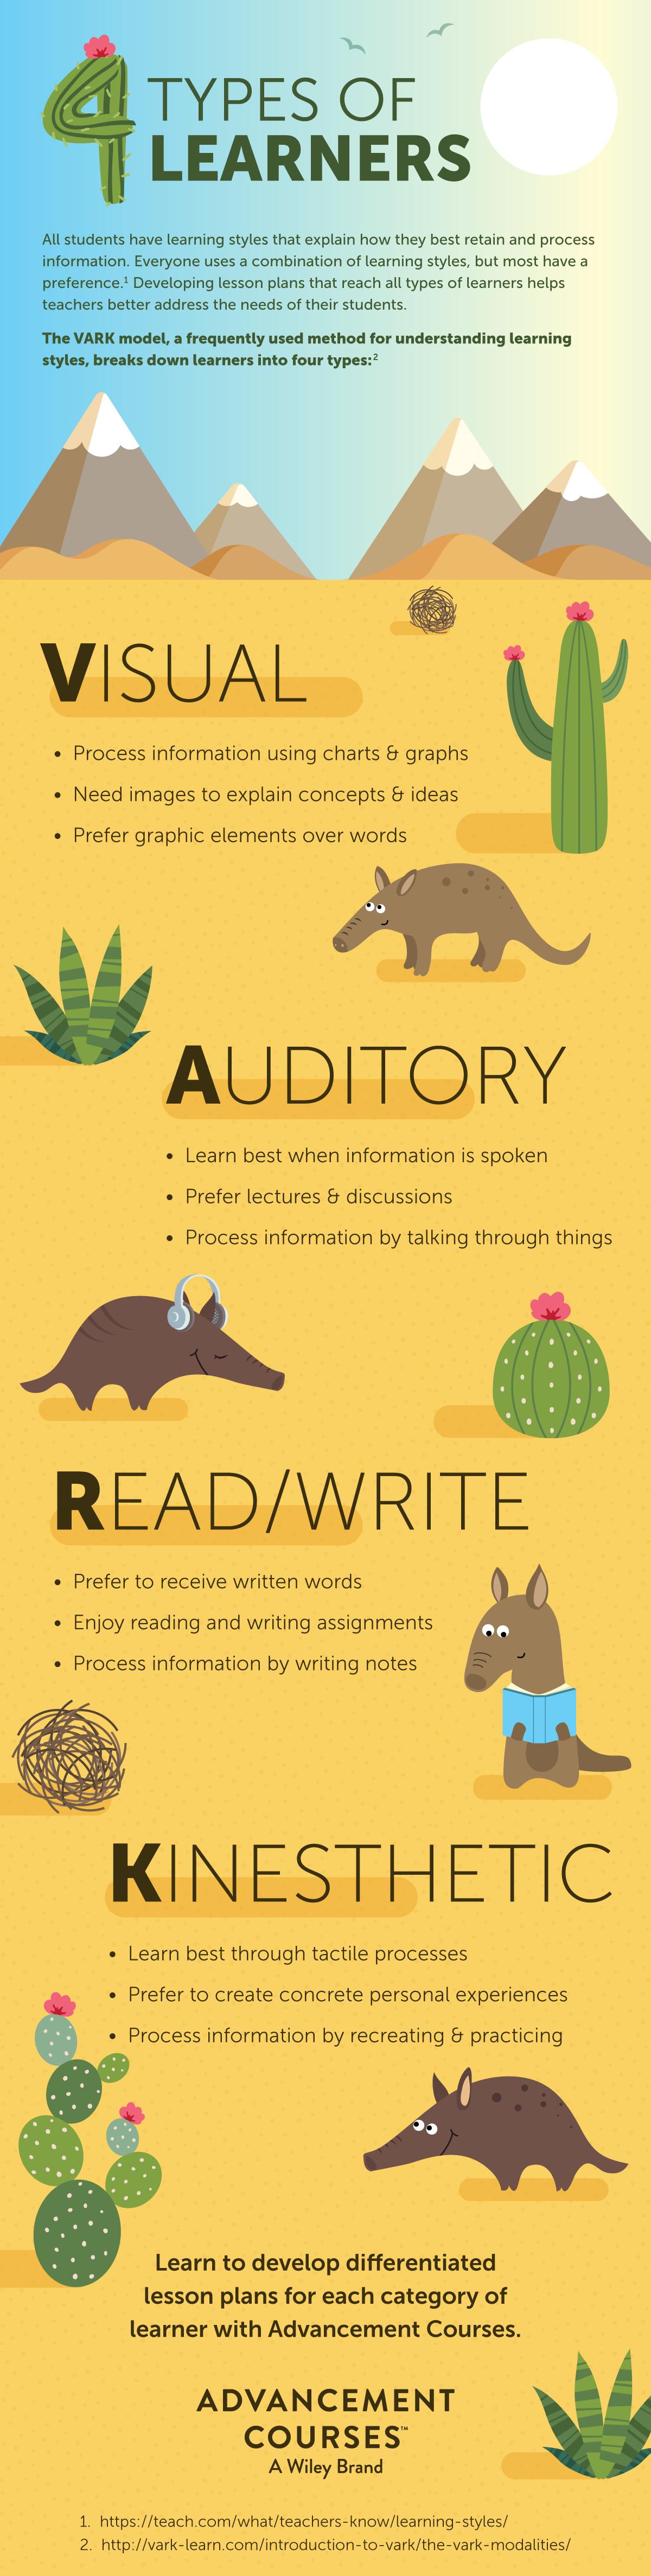 4 Types of Learners in Education-VARK